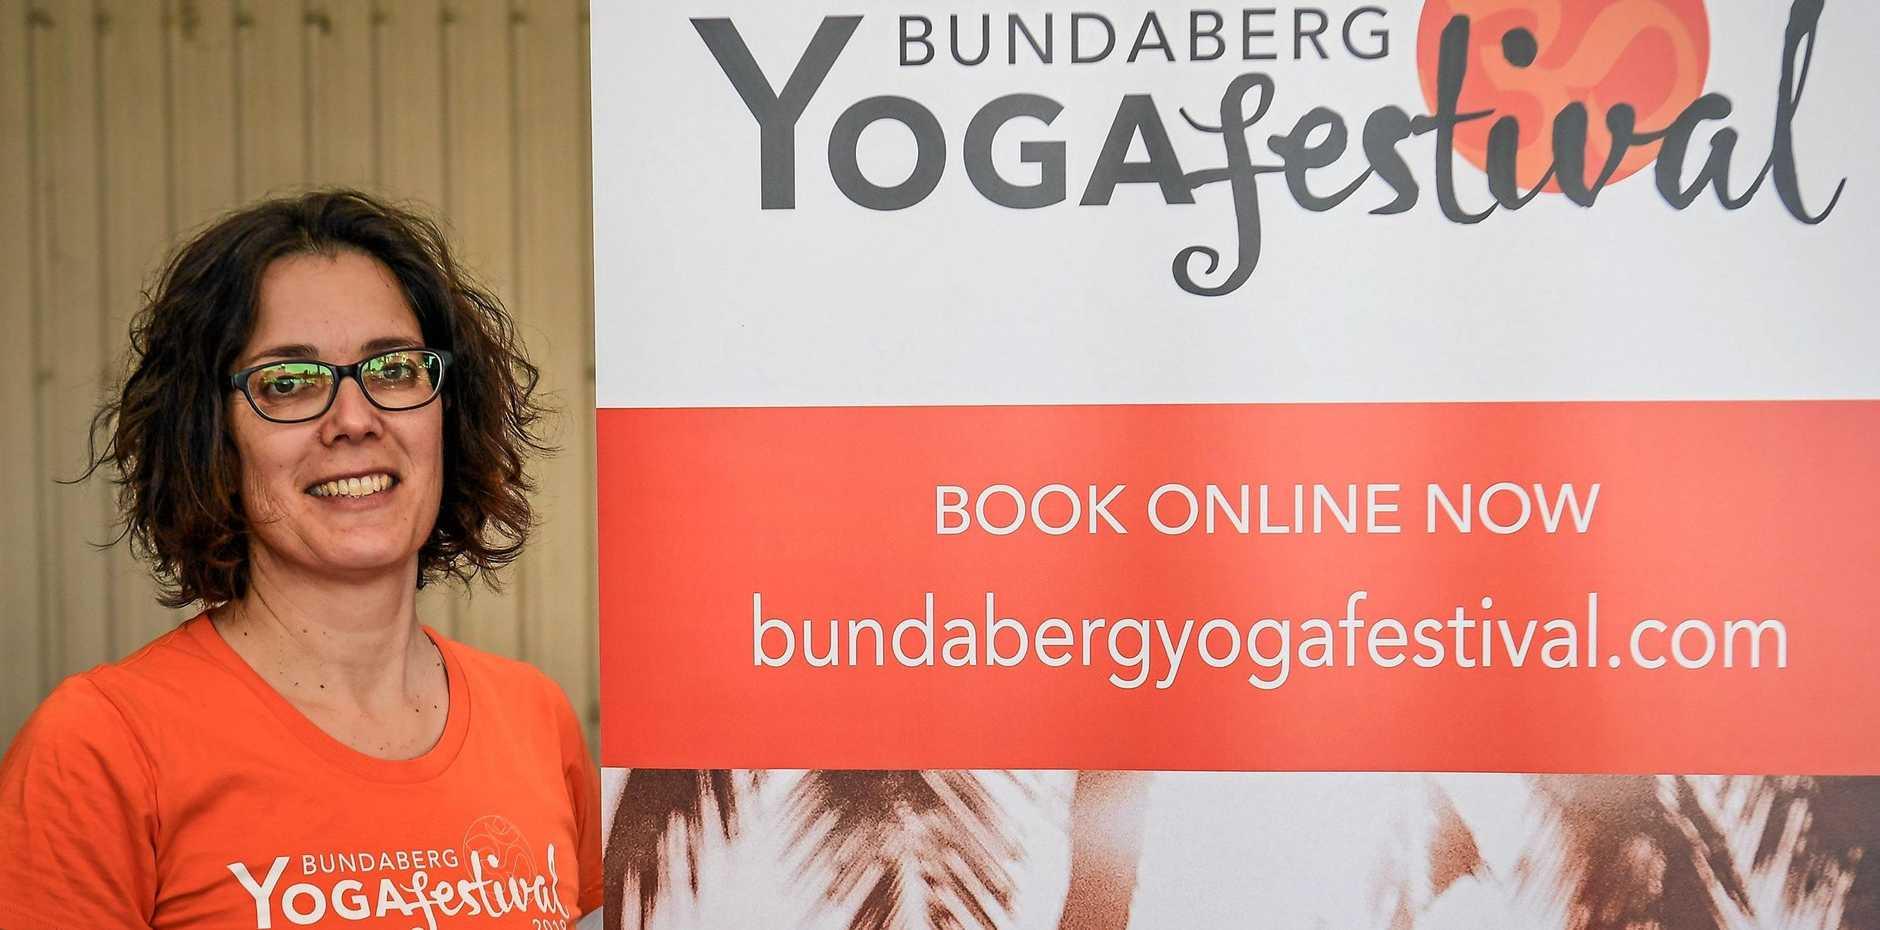 BIG HIT: Organiser of the Bundaberg Yoga Festival, Tamar Boas.